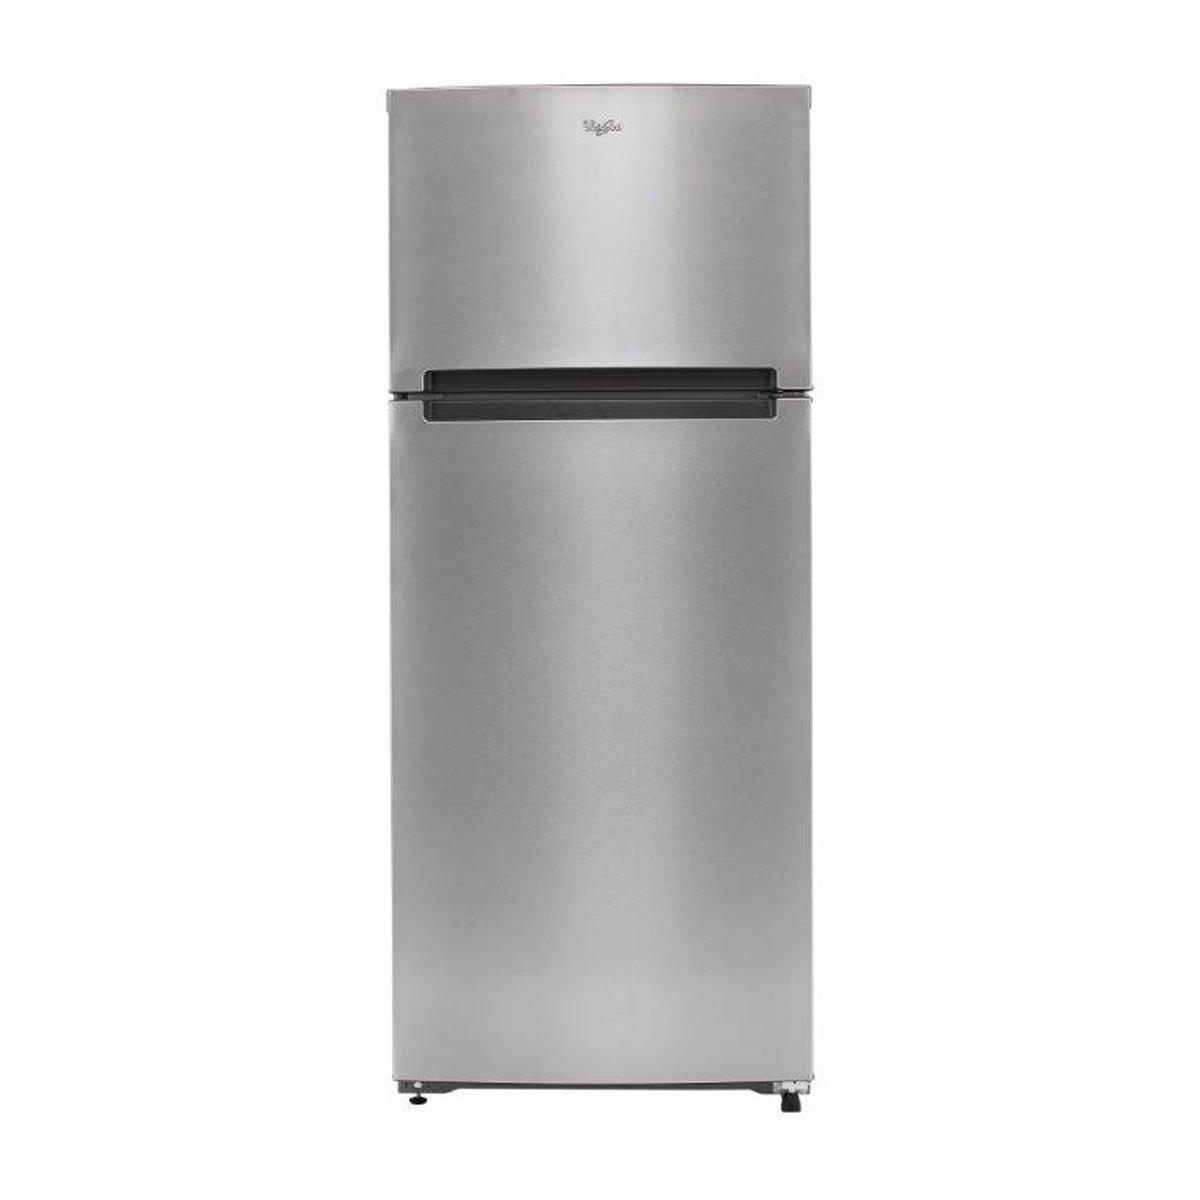 Refrigerador 2 puertas 18 p3 wt1850d silver whirlpool for Refrigerador whirlpool